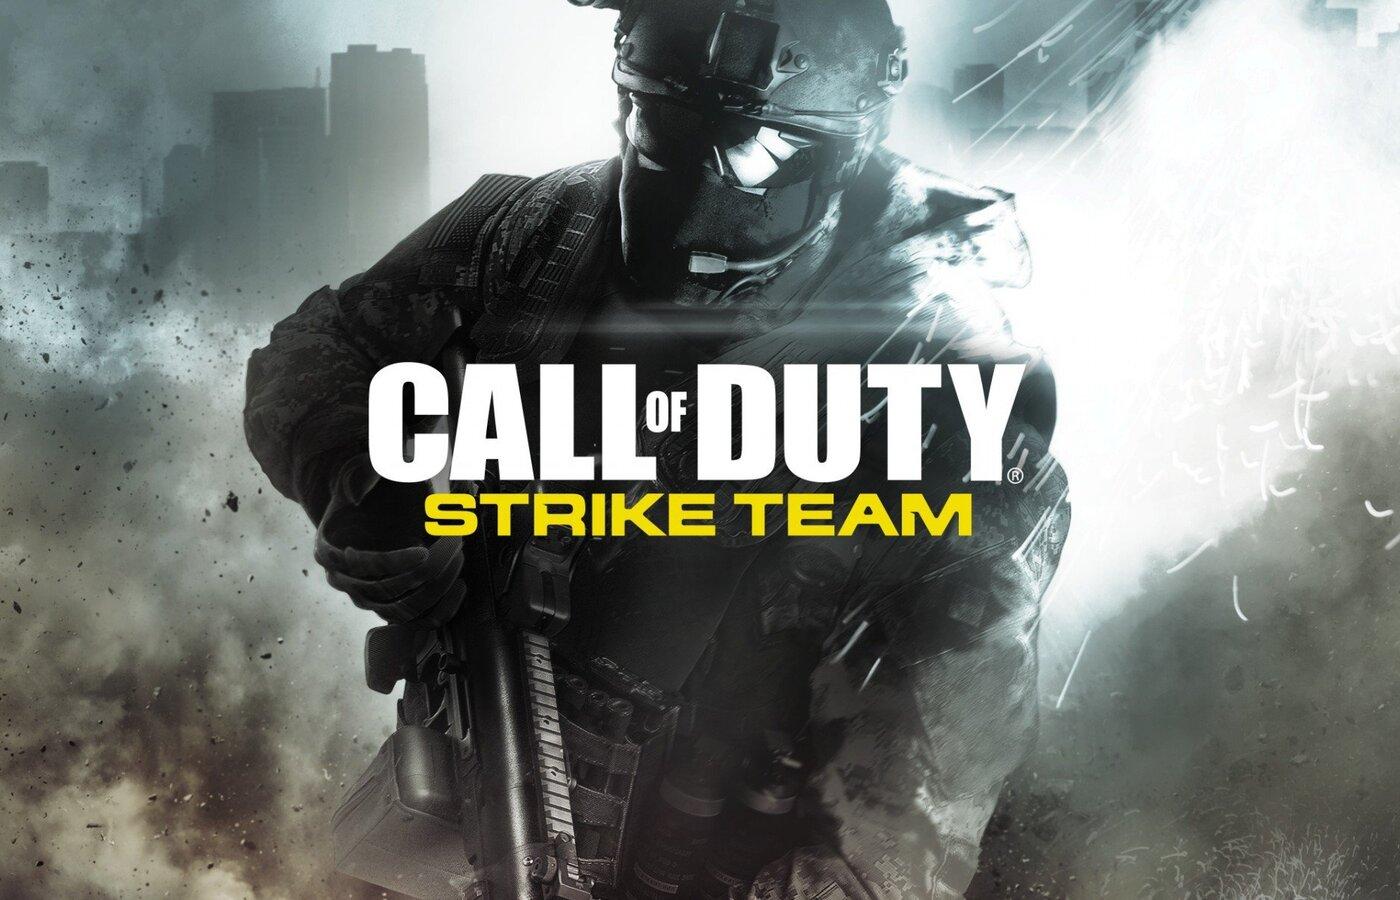 call-of-duty-strike-team.jpg